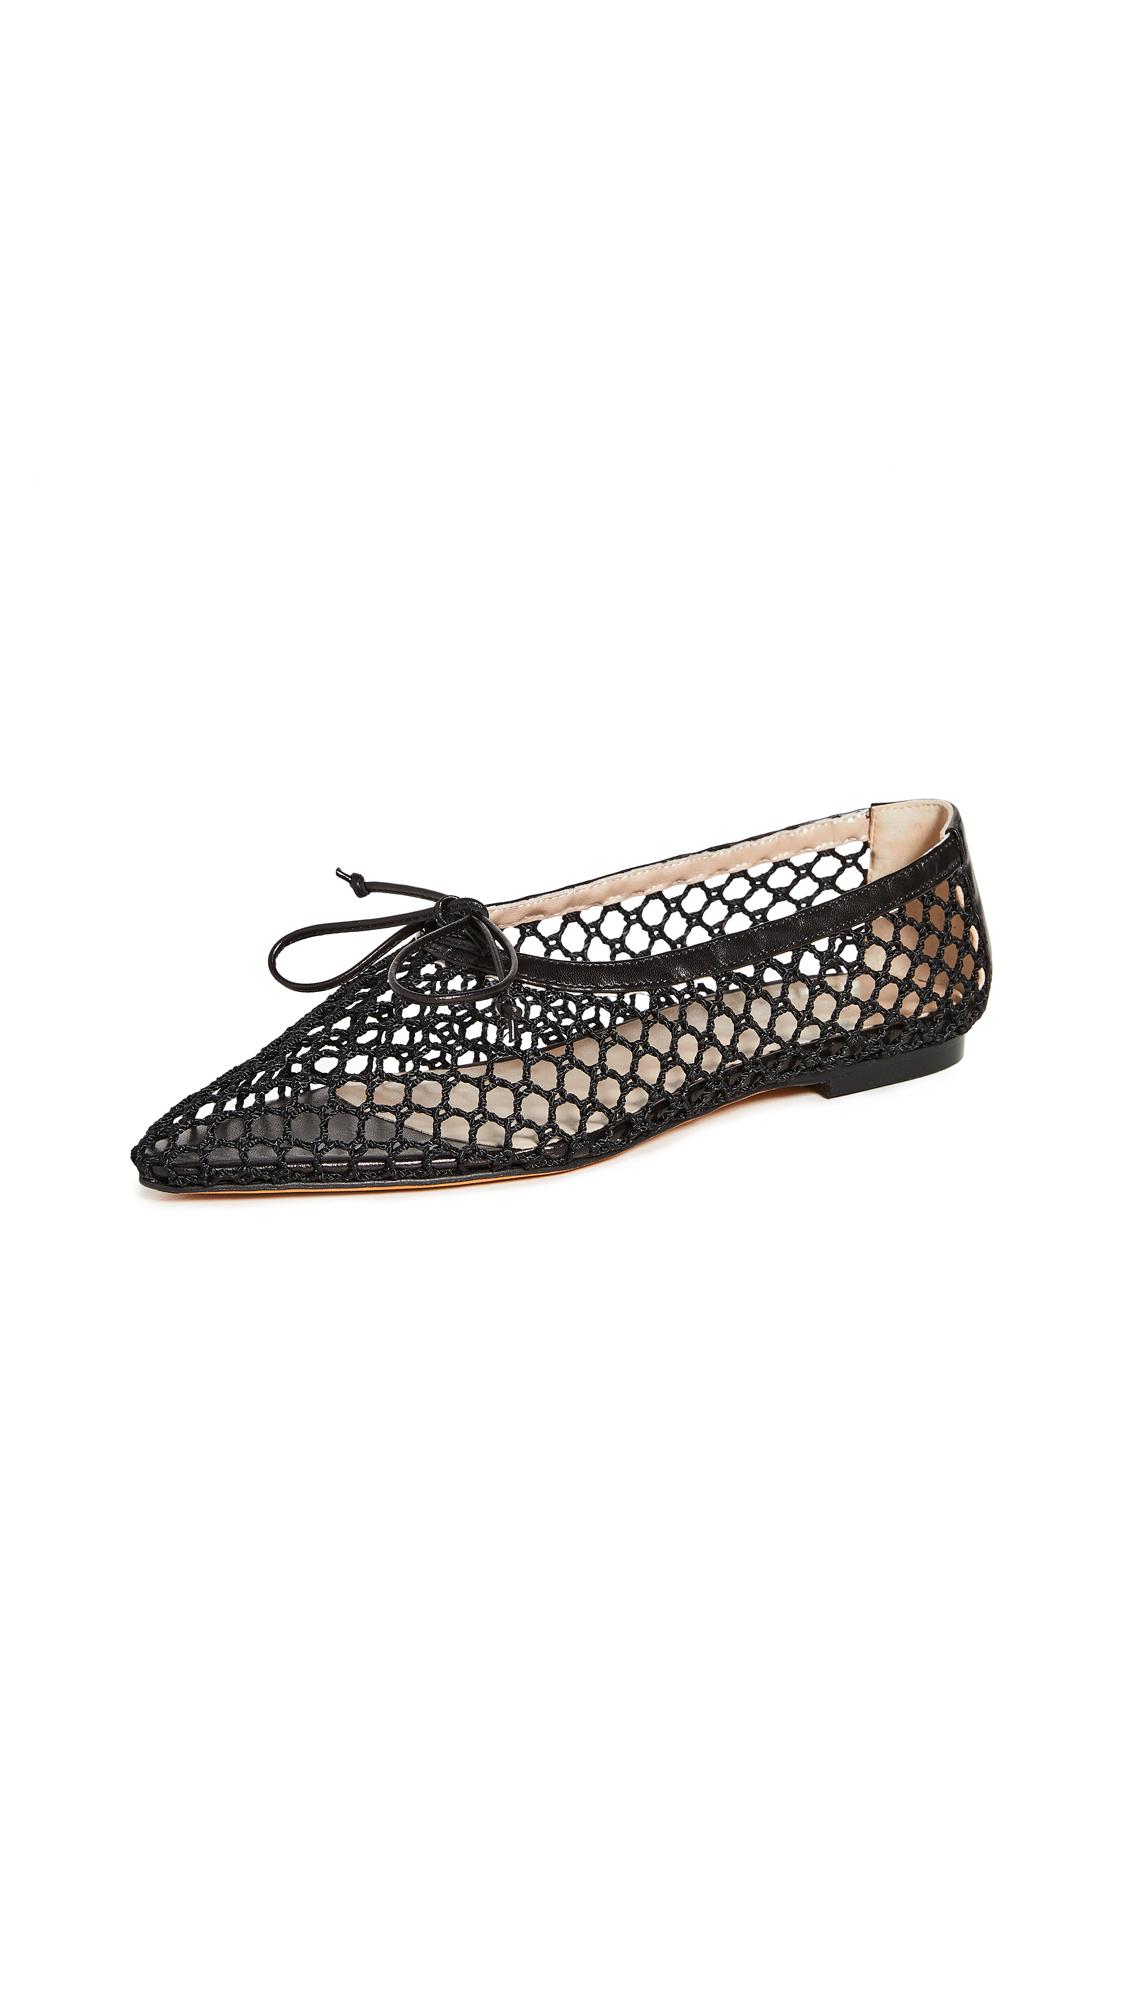 Buy Maryam Nassir Zadeh Patio Loafers online, shop Maryam Nassir Zadeh